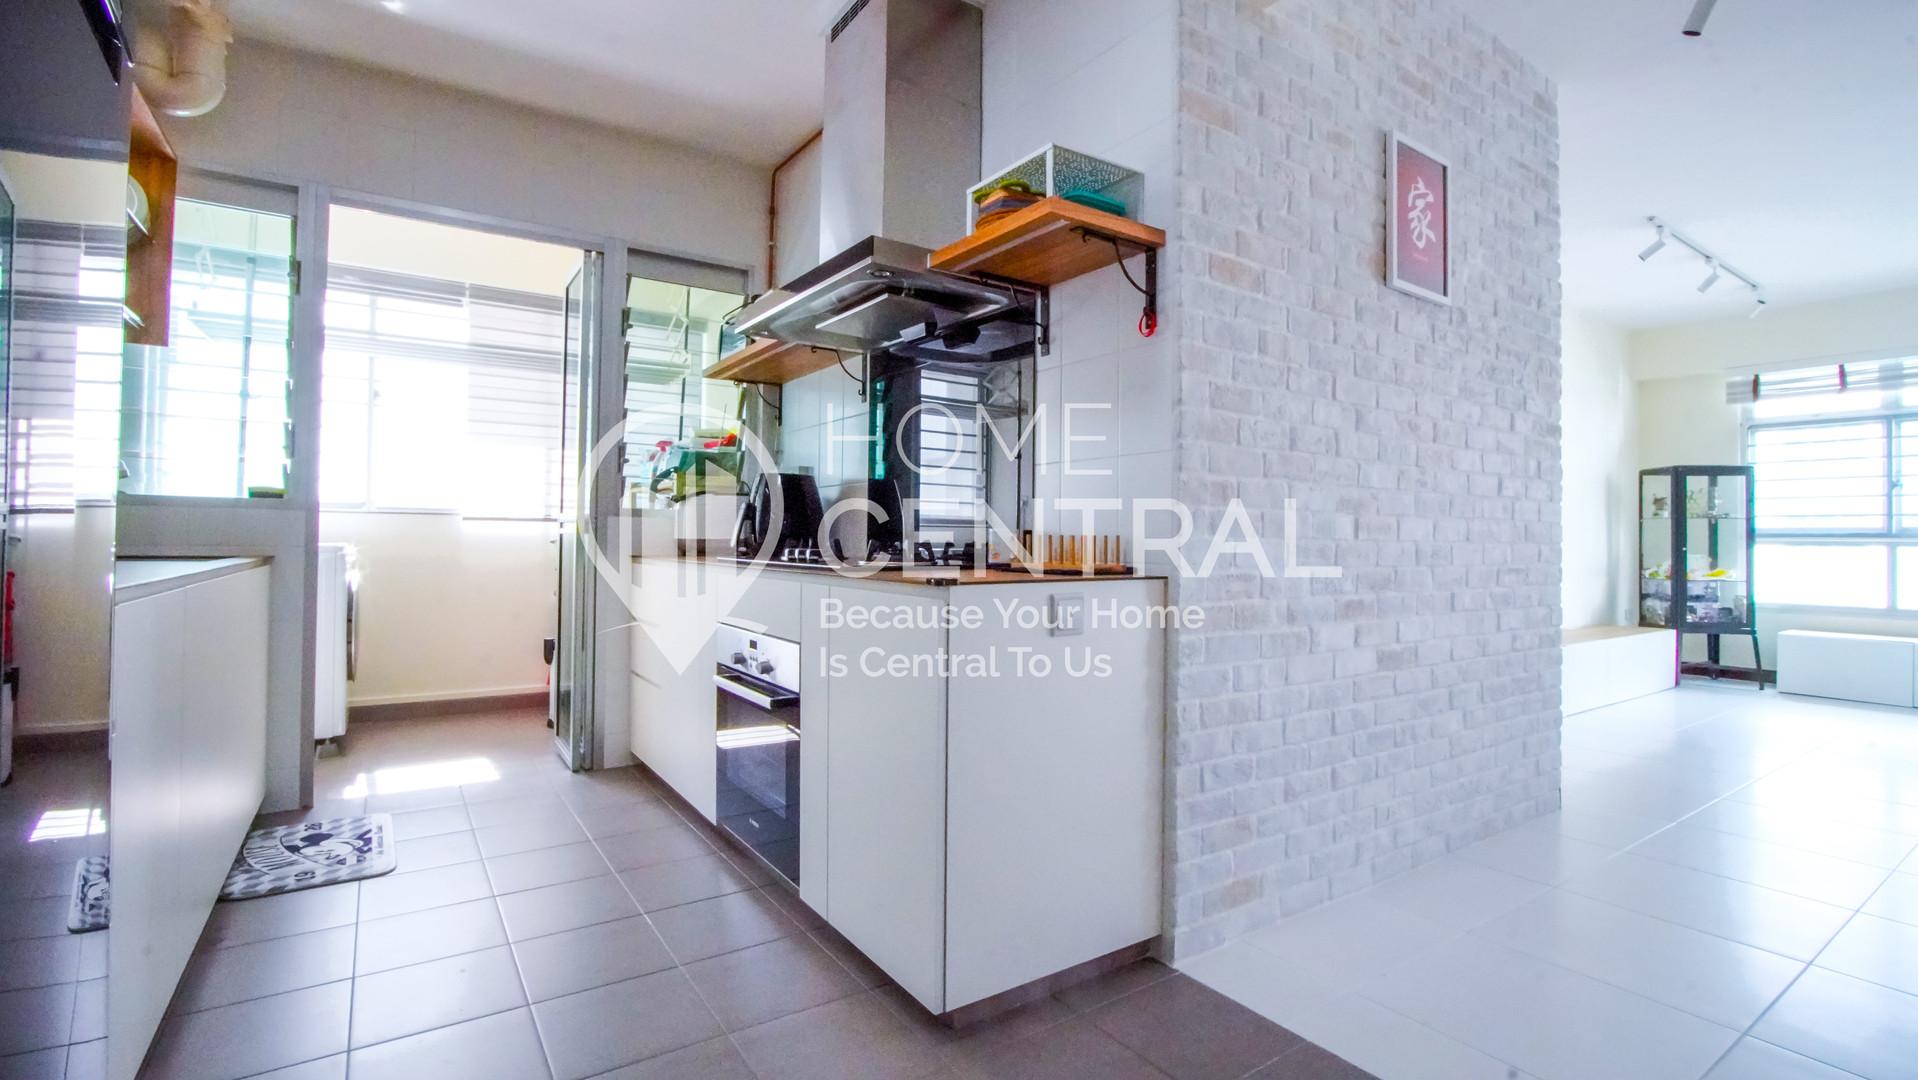 7 Kitchen 1 DSC00987-HDR-min.jpg